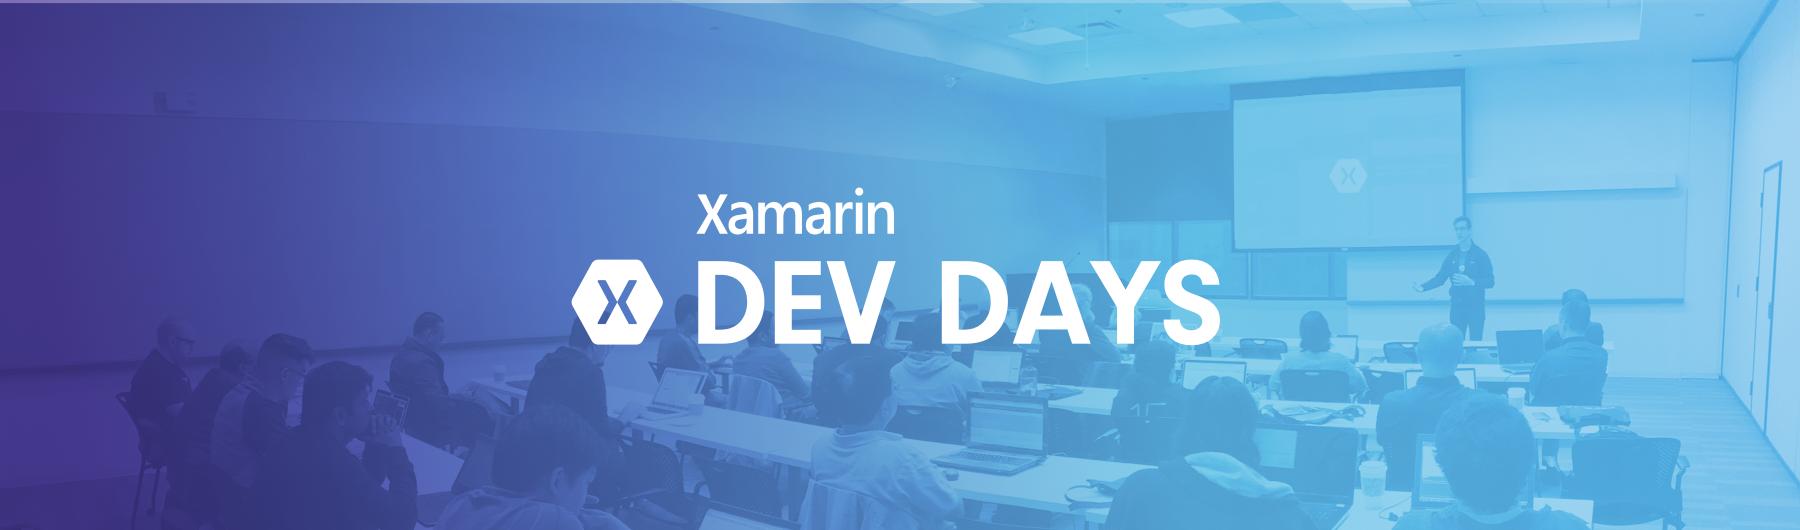 Xamarin Dev Days - Orlando